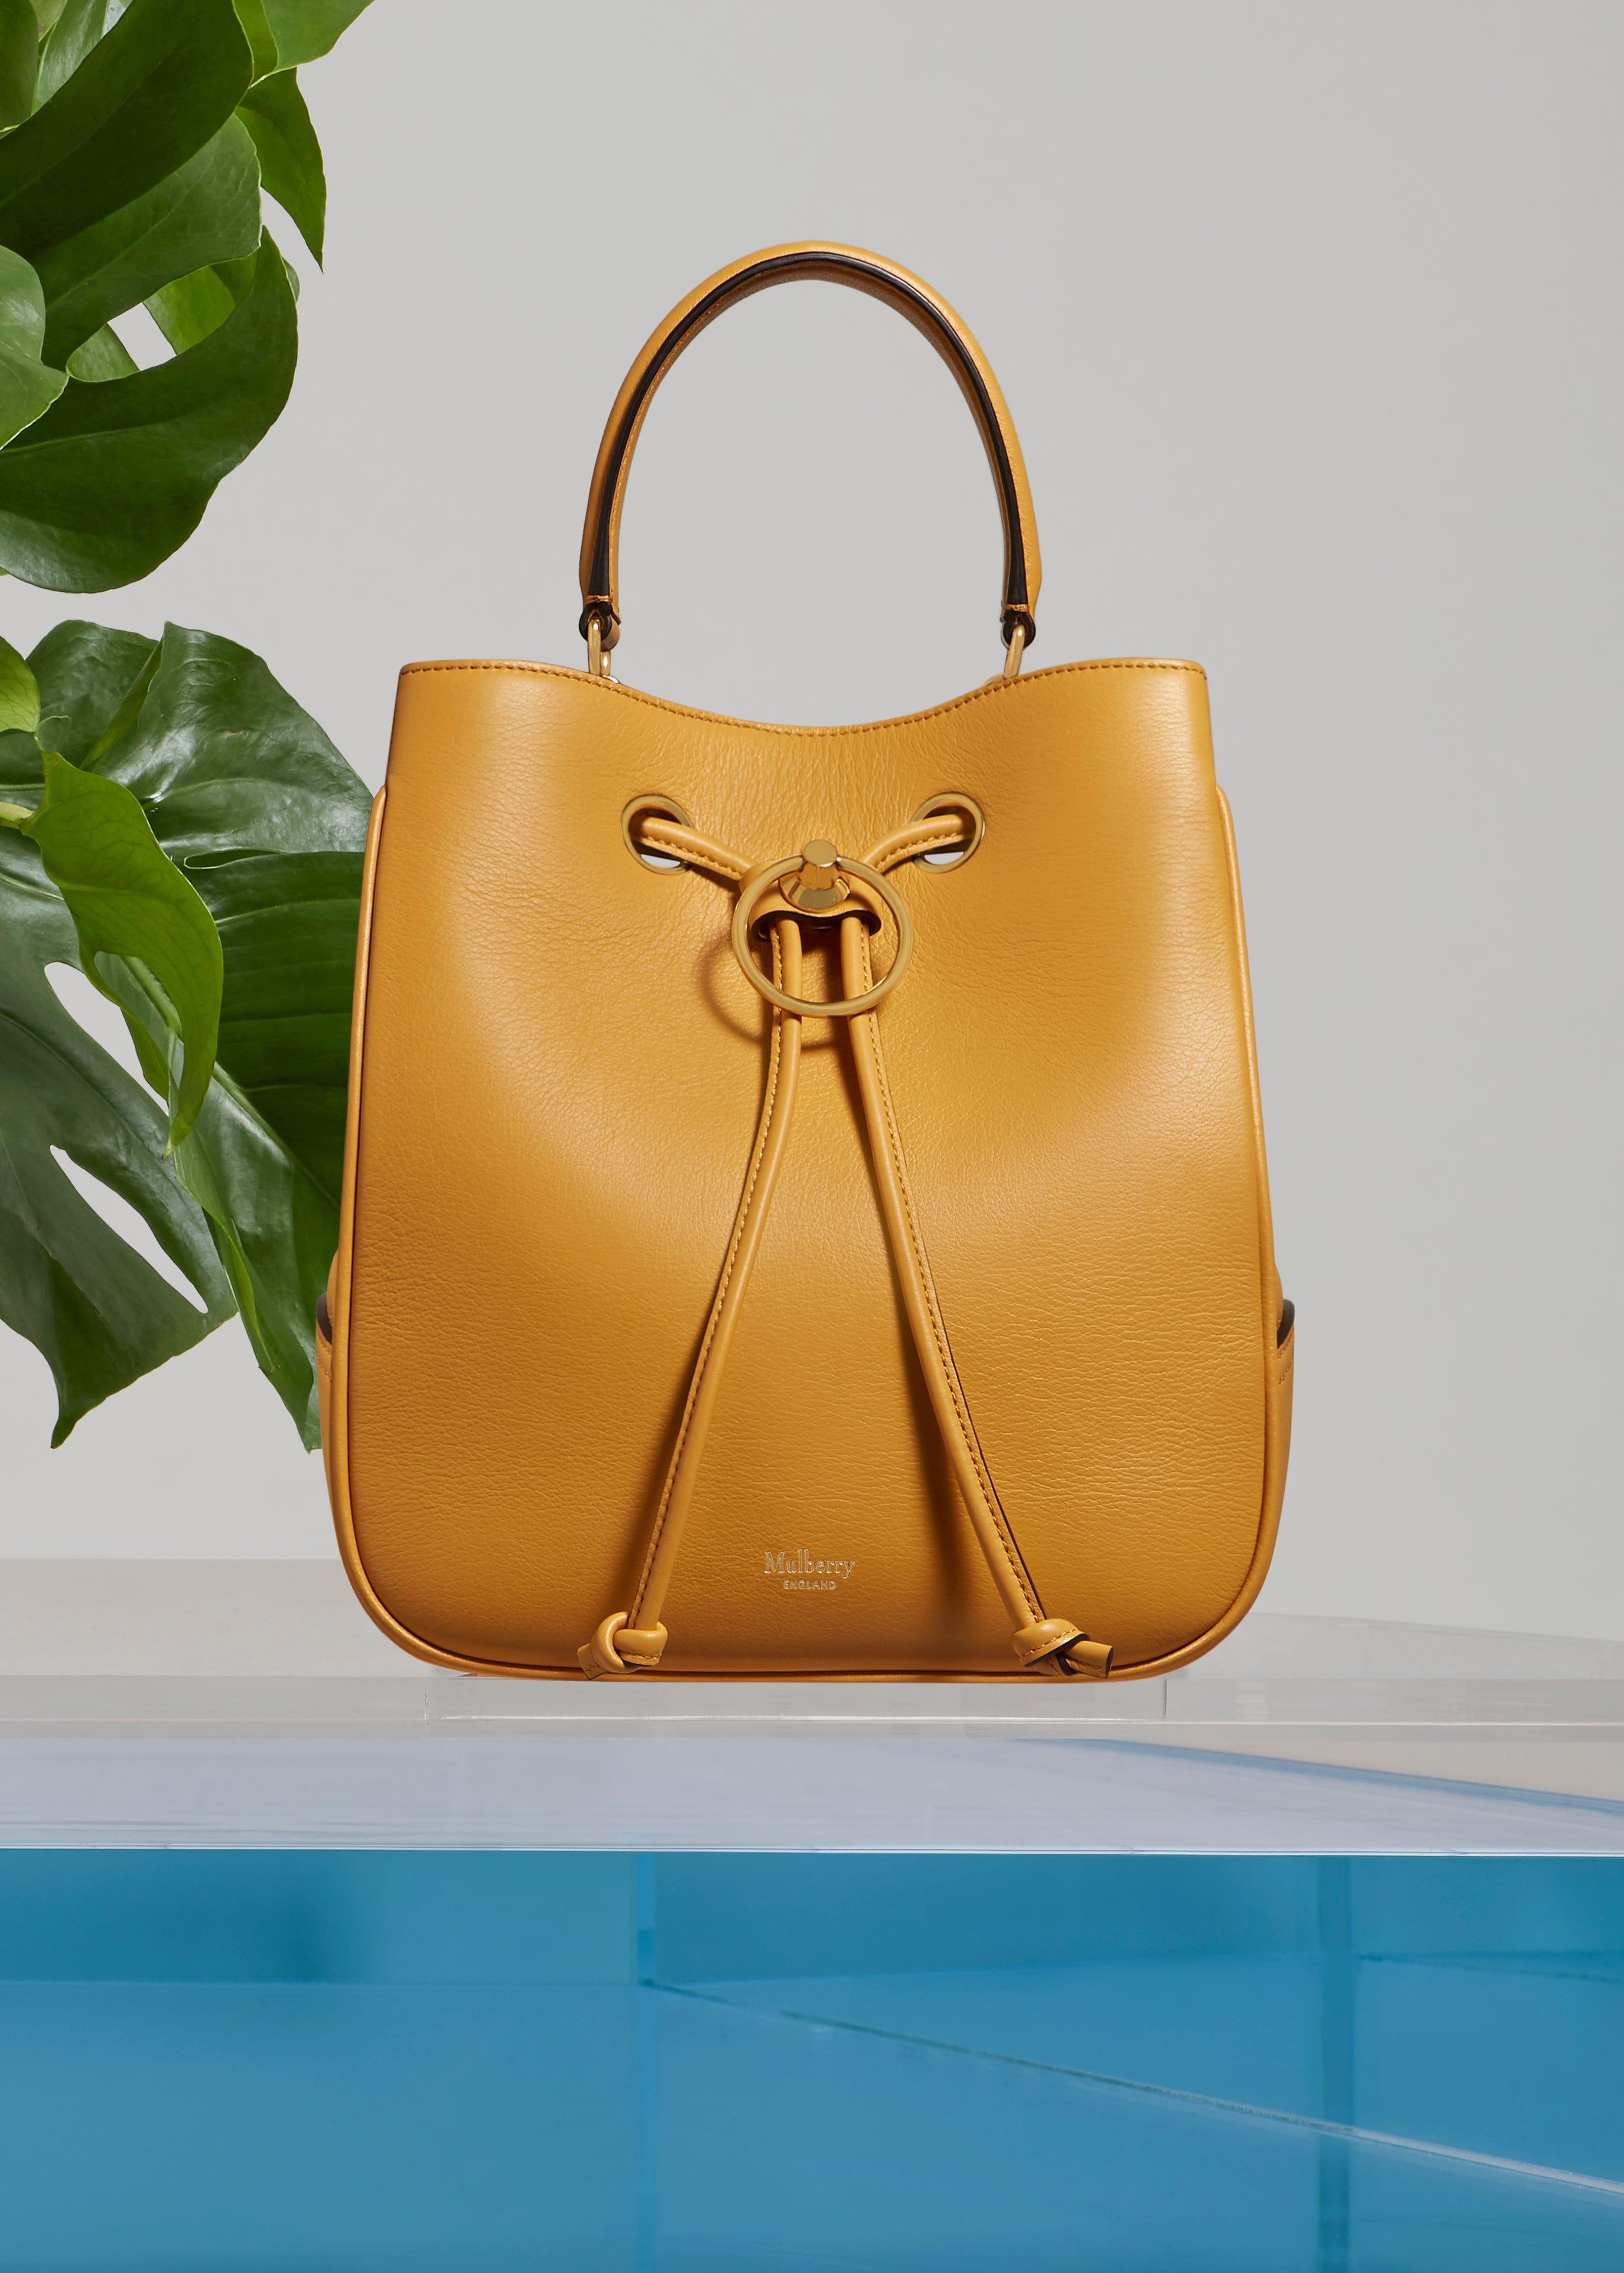 Mulberry s New Hampstead Handbag 7ad9d8641b